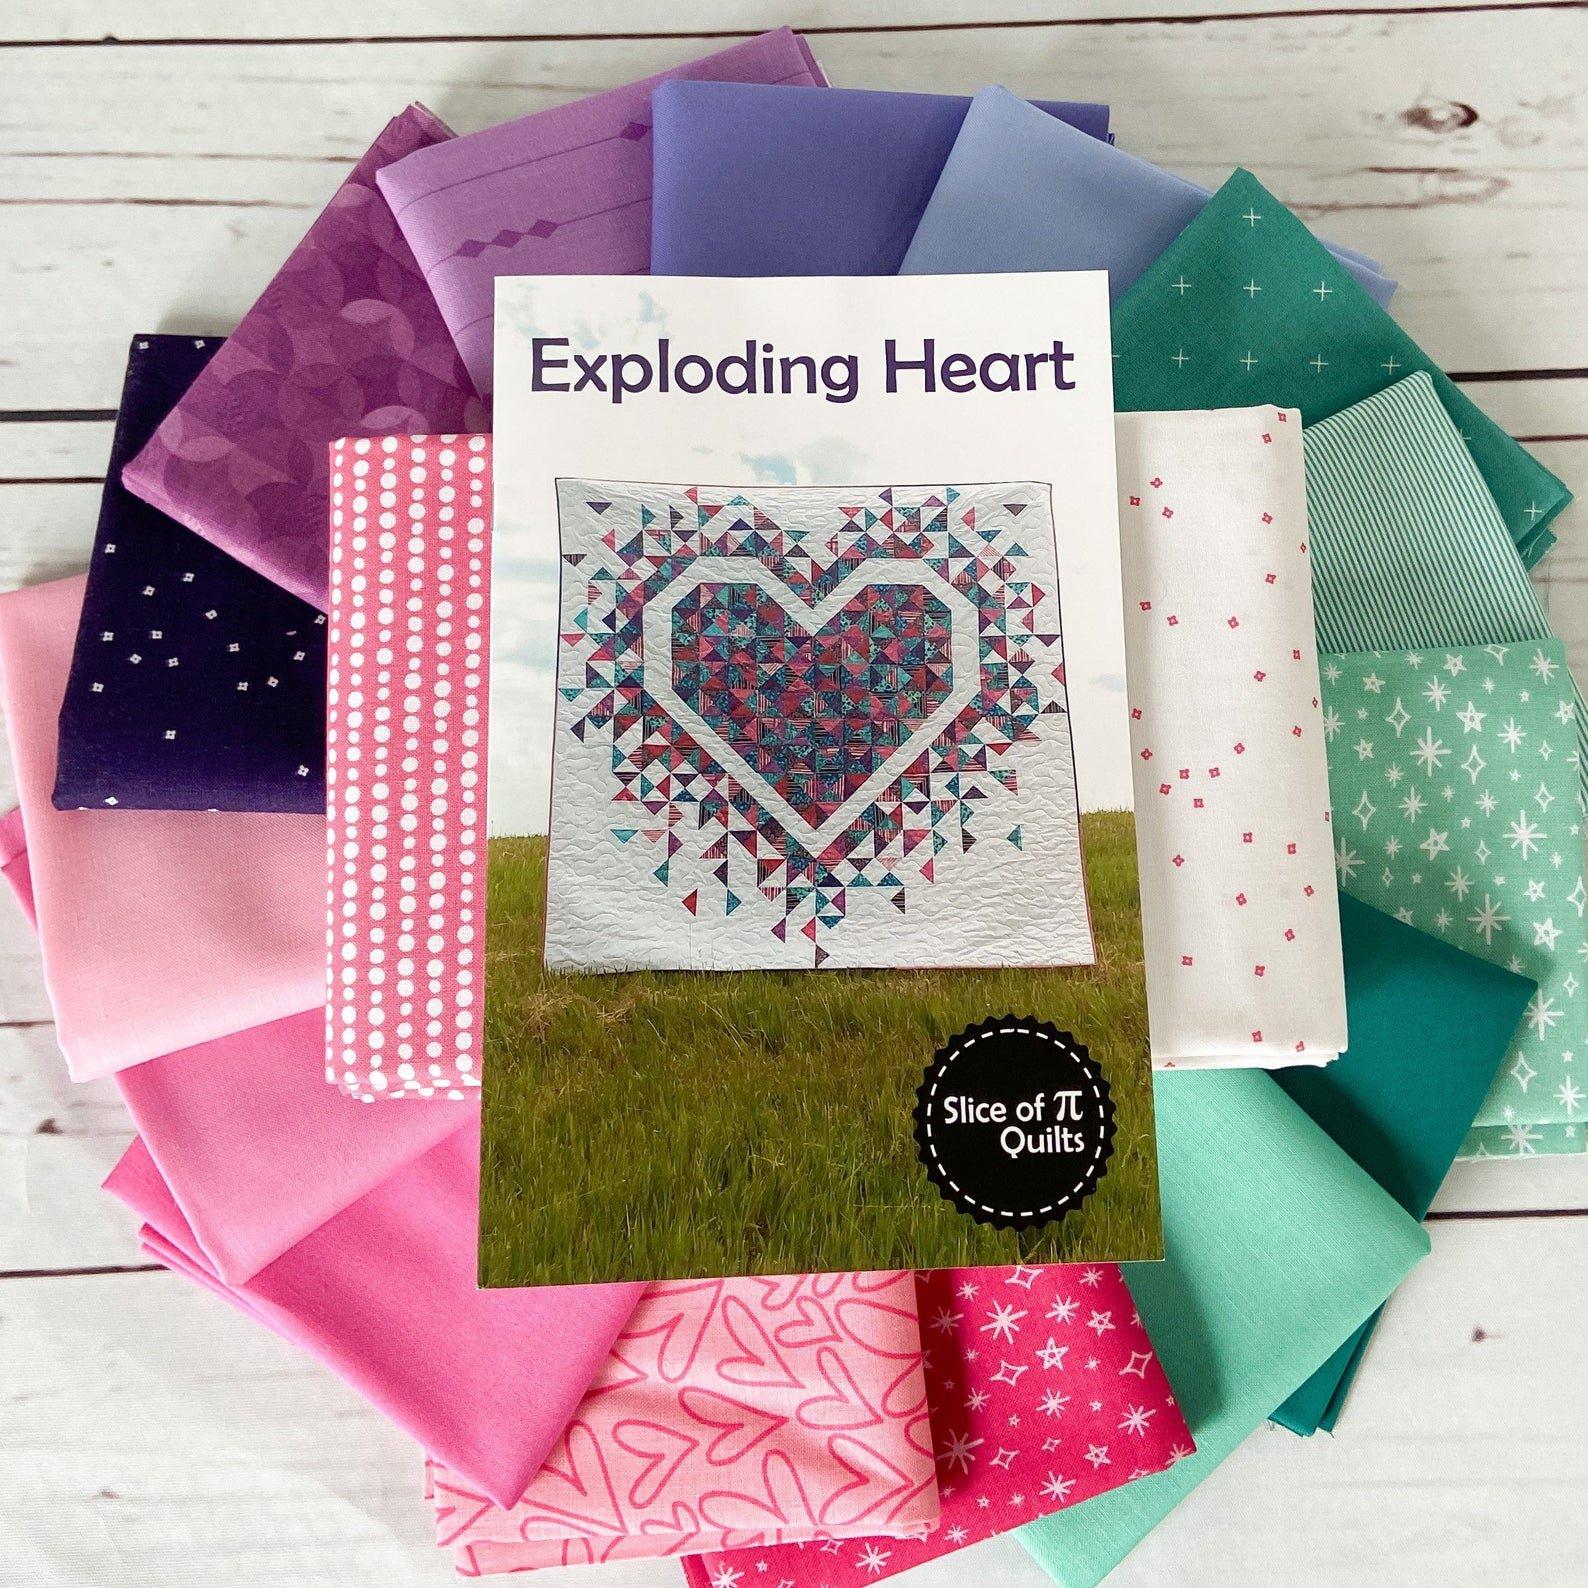 Exploding Hearts Quilt Kit